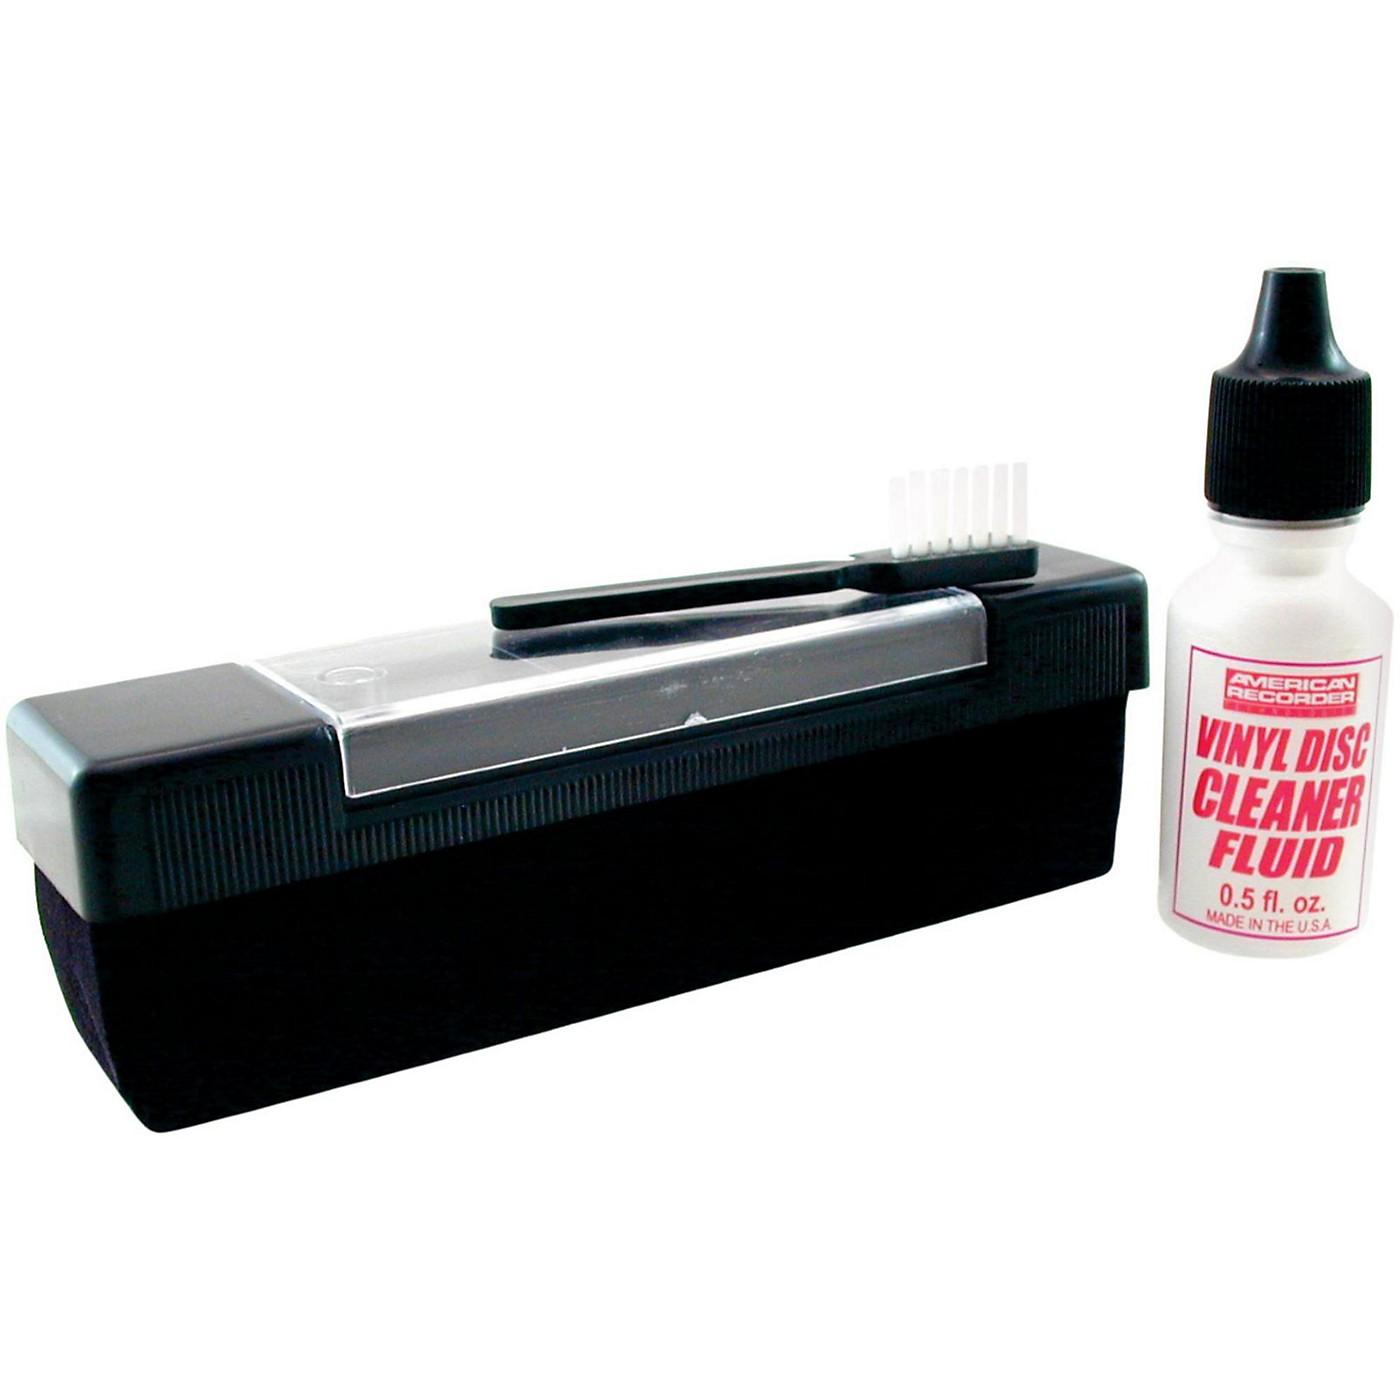 American Recorder Technologies VDC-120 Vinyl Disc Cleaner thumbnail